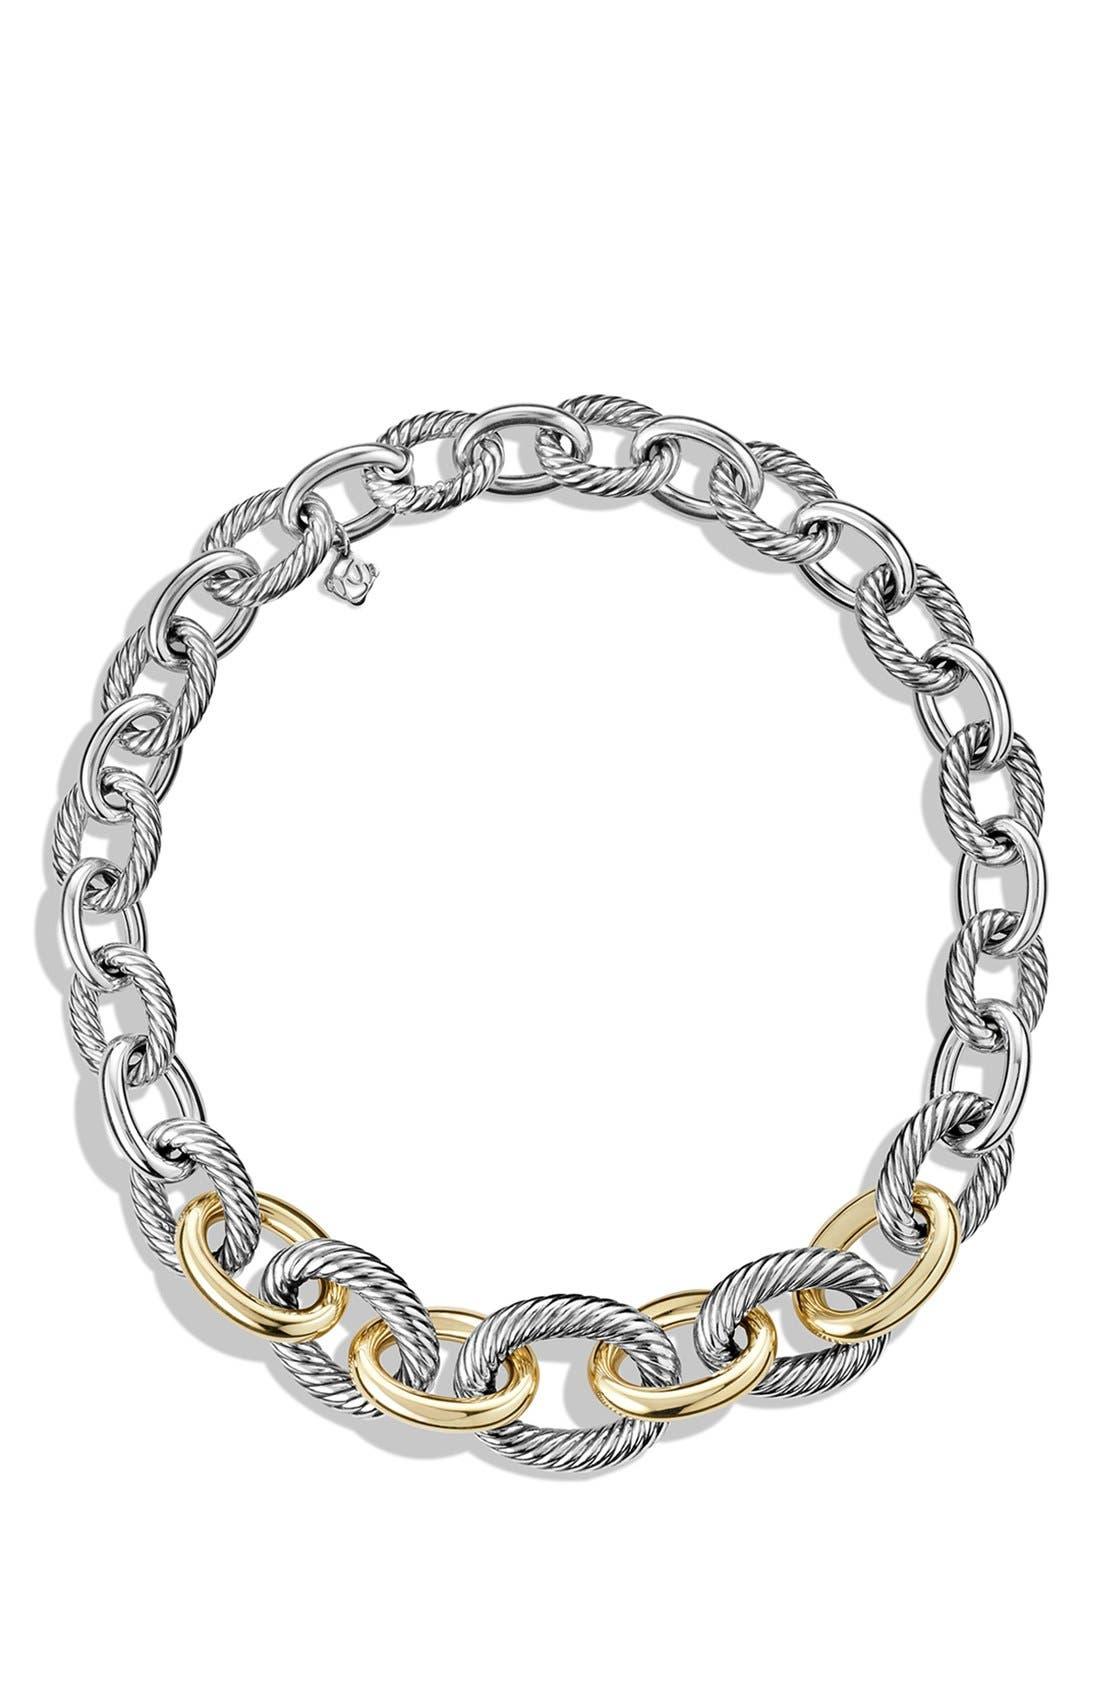 DAVID YURMAN Chain Medium Oval Necklace with 14K Gold